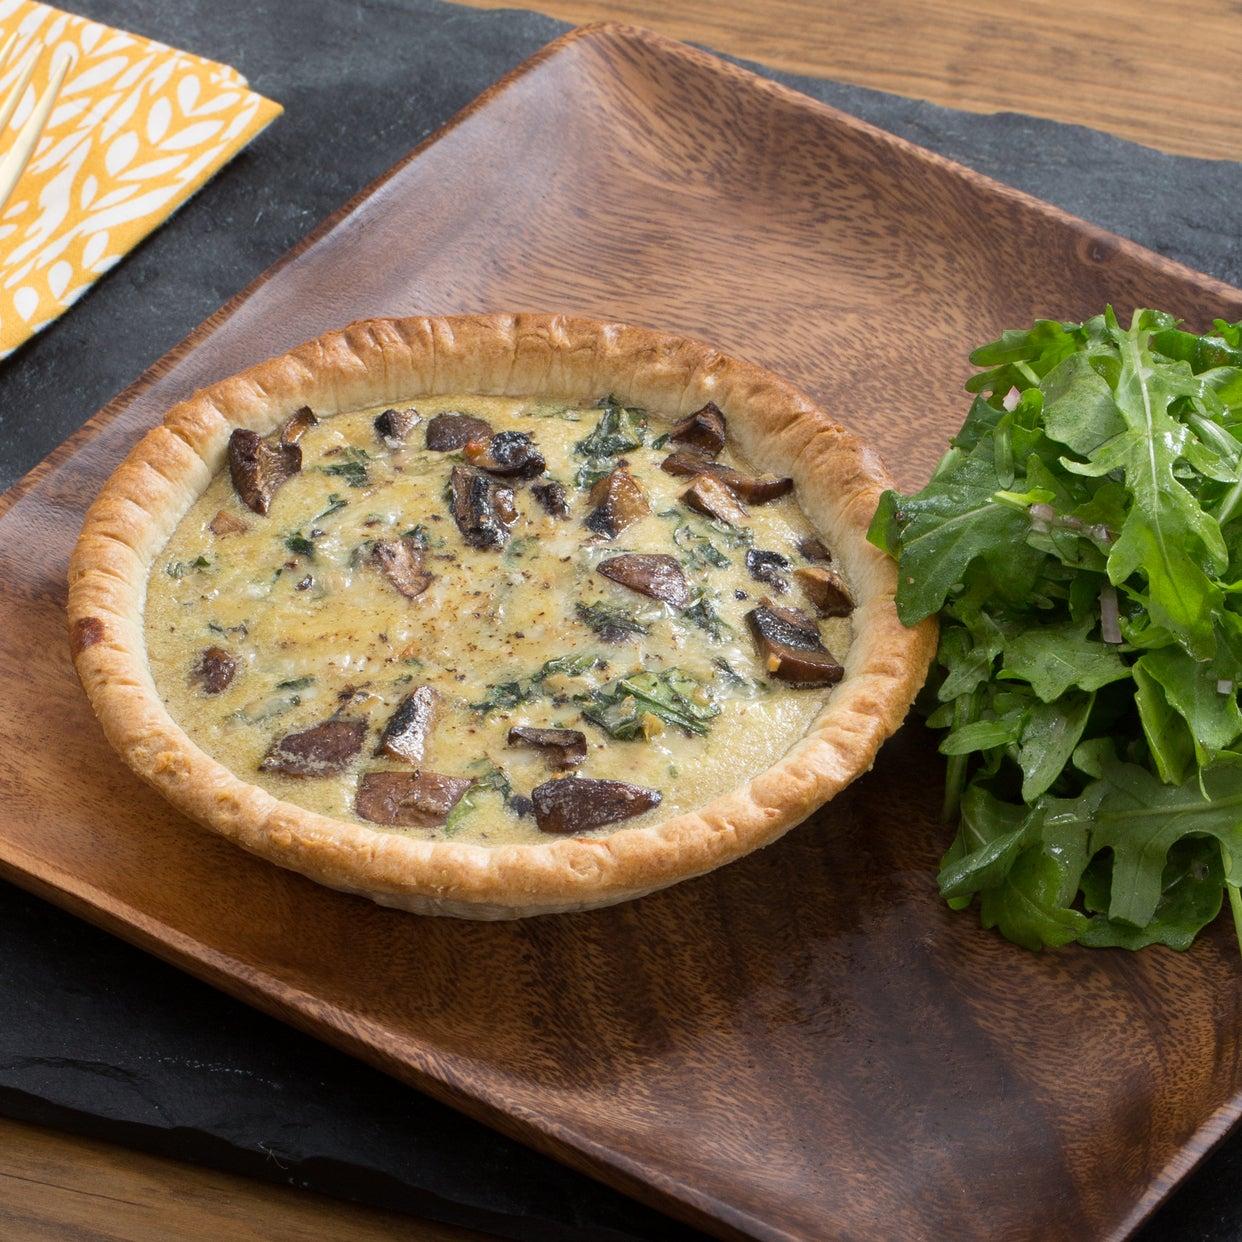 Mushroom & Swiss Chard Quiches with Gruyere Cheese & Arugula Salad